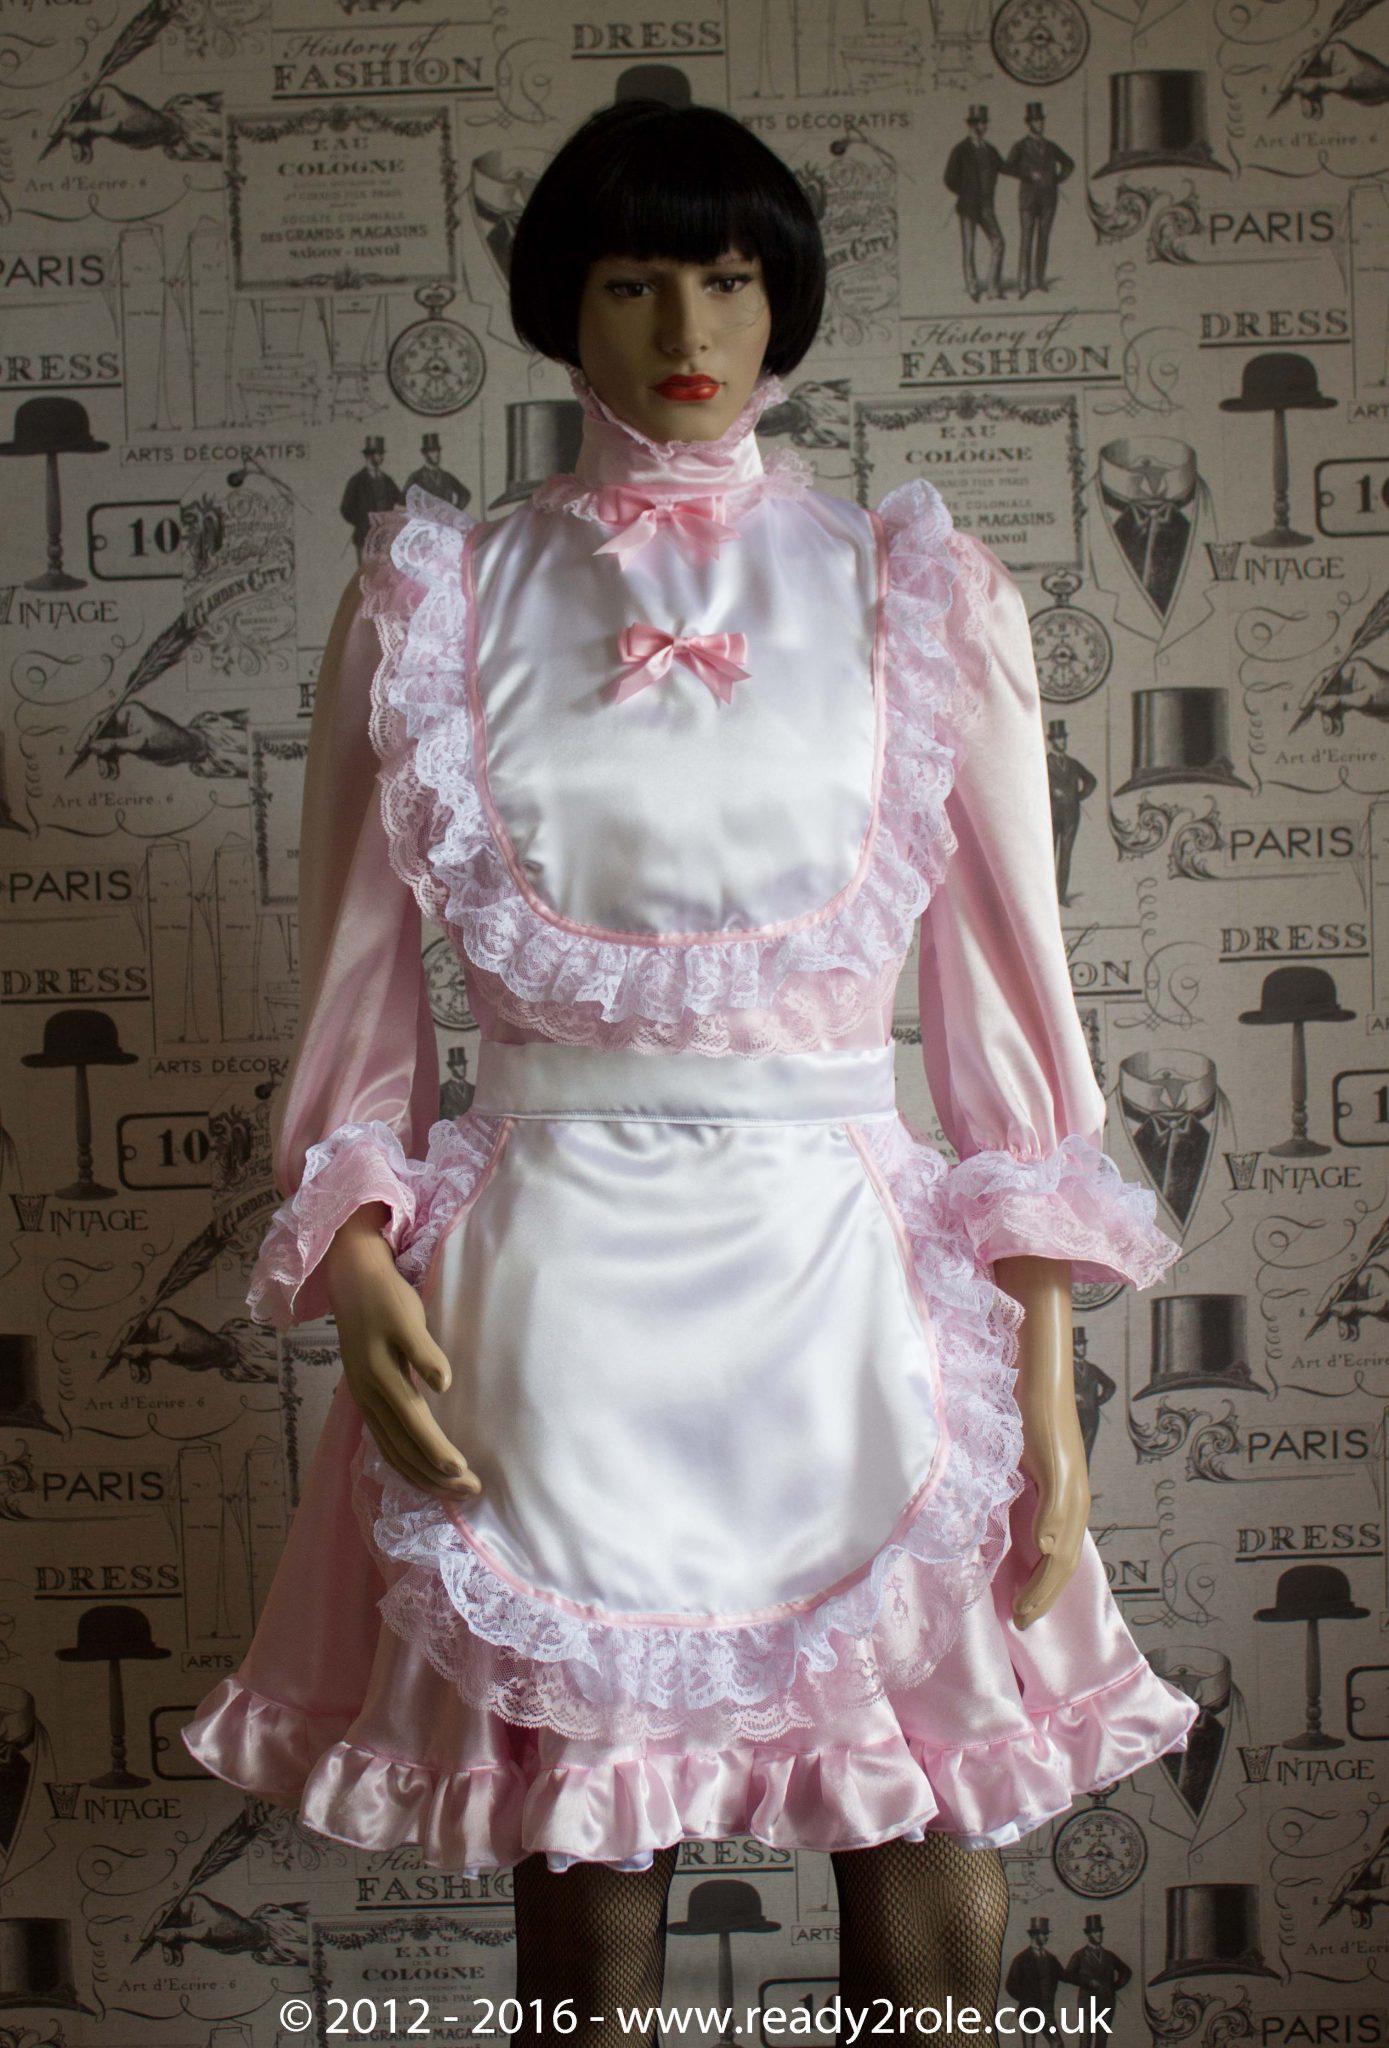 Hi Neck Frilly Sissy Dress (Long Sleeved)